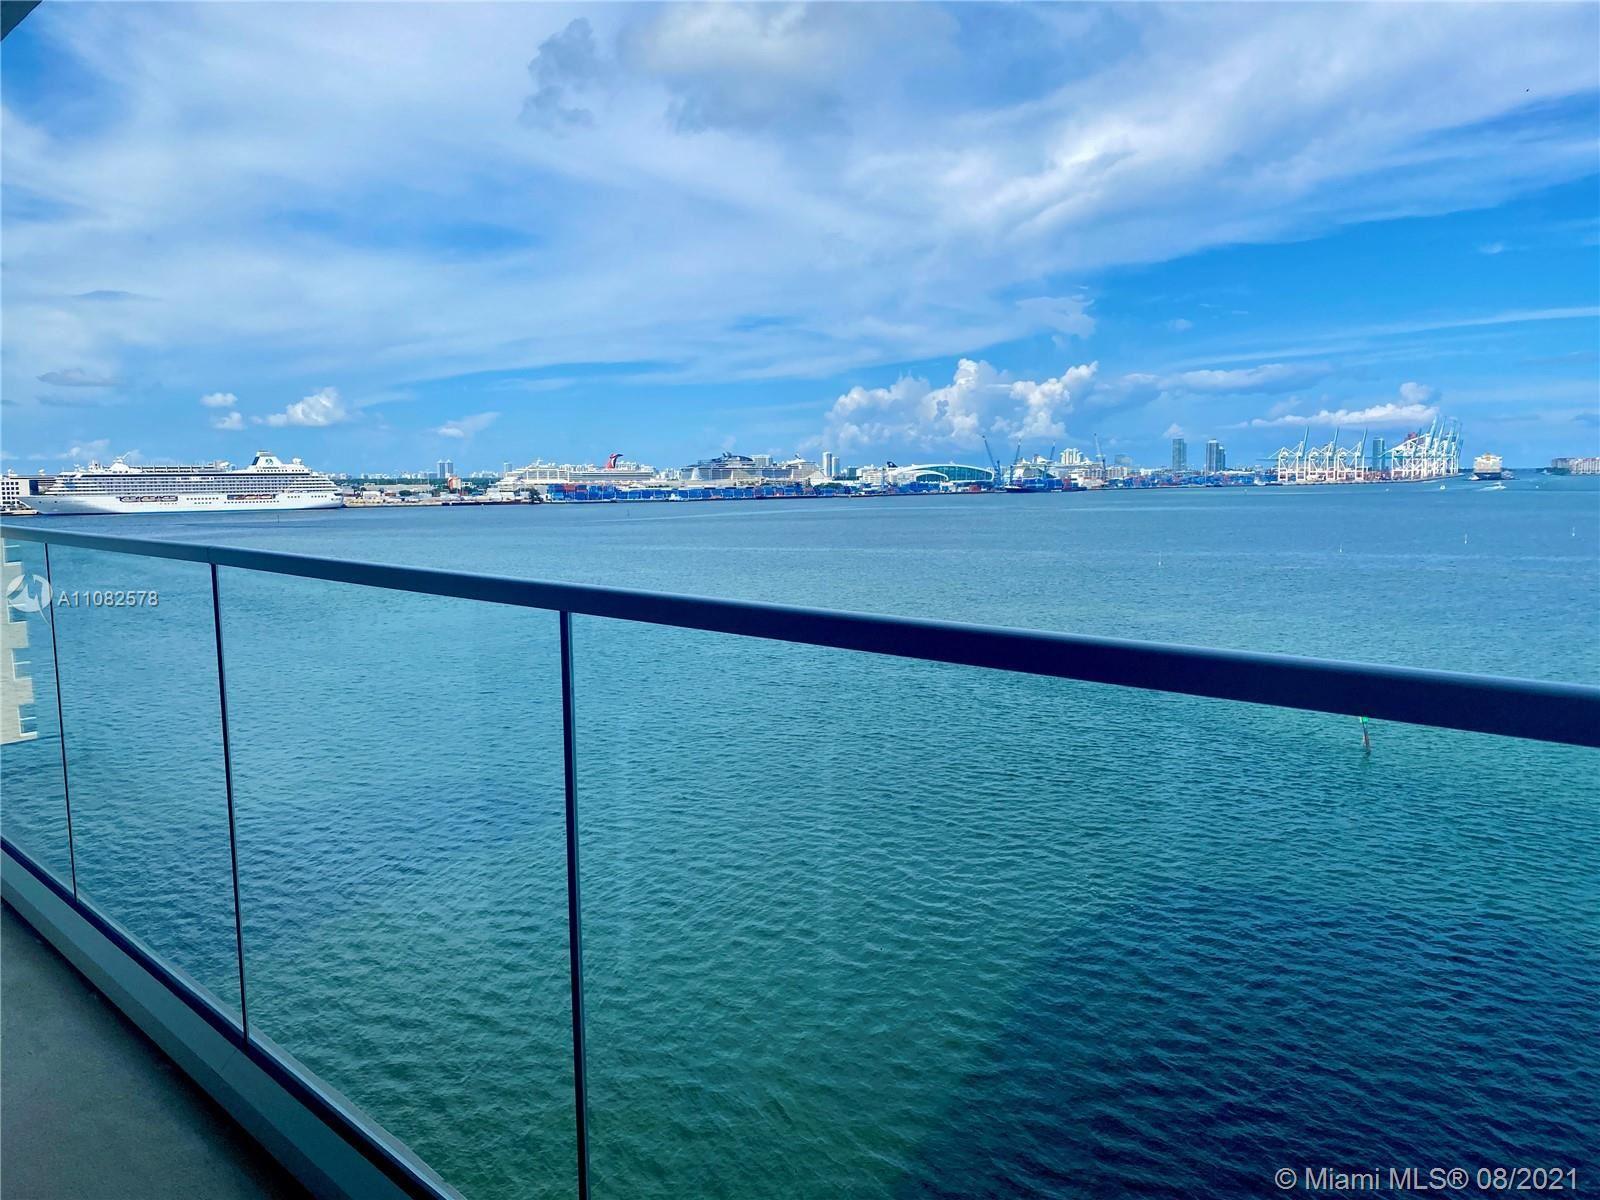 800 Claughton Island Dr #902, Miami, FL 33131 - #: A11082578